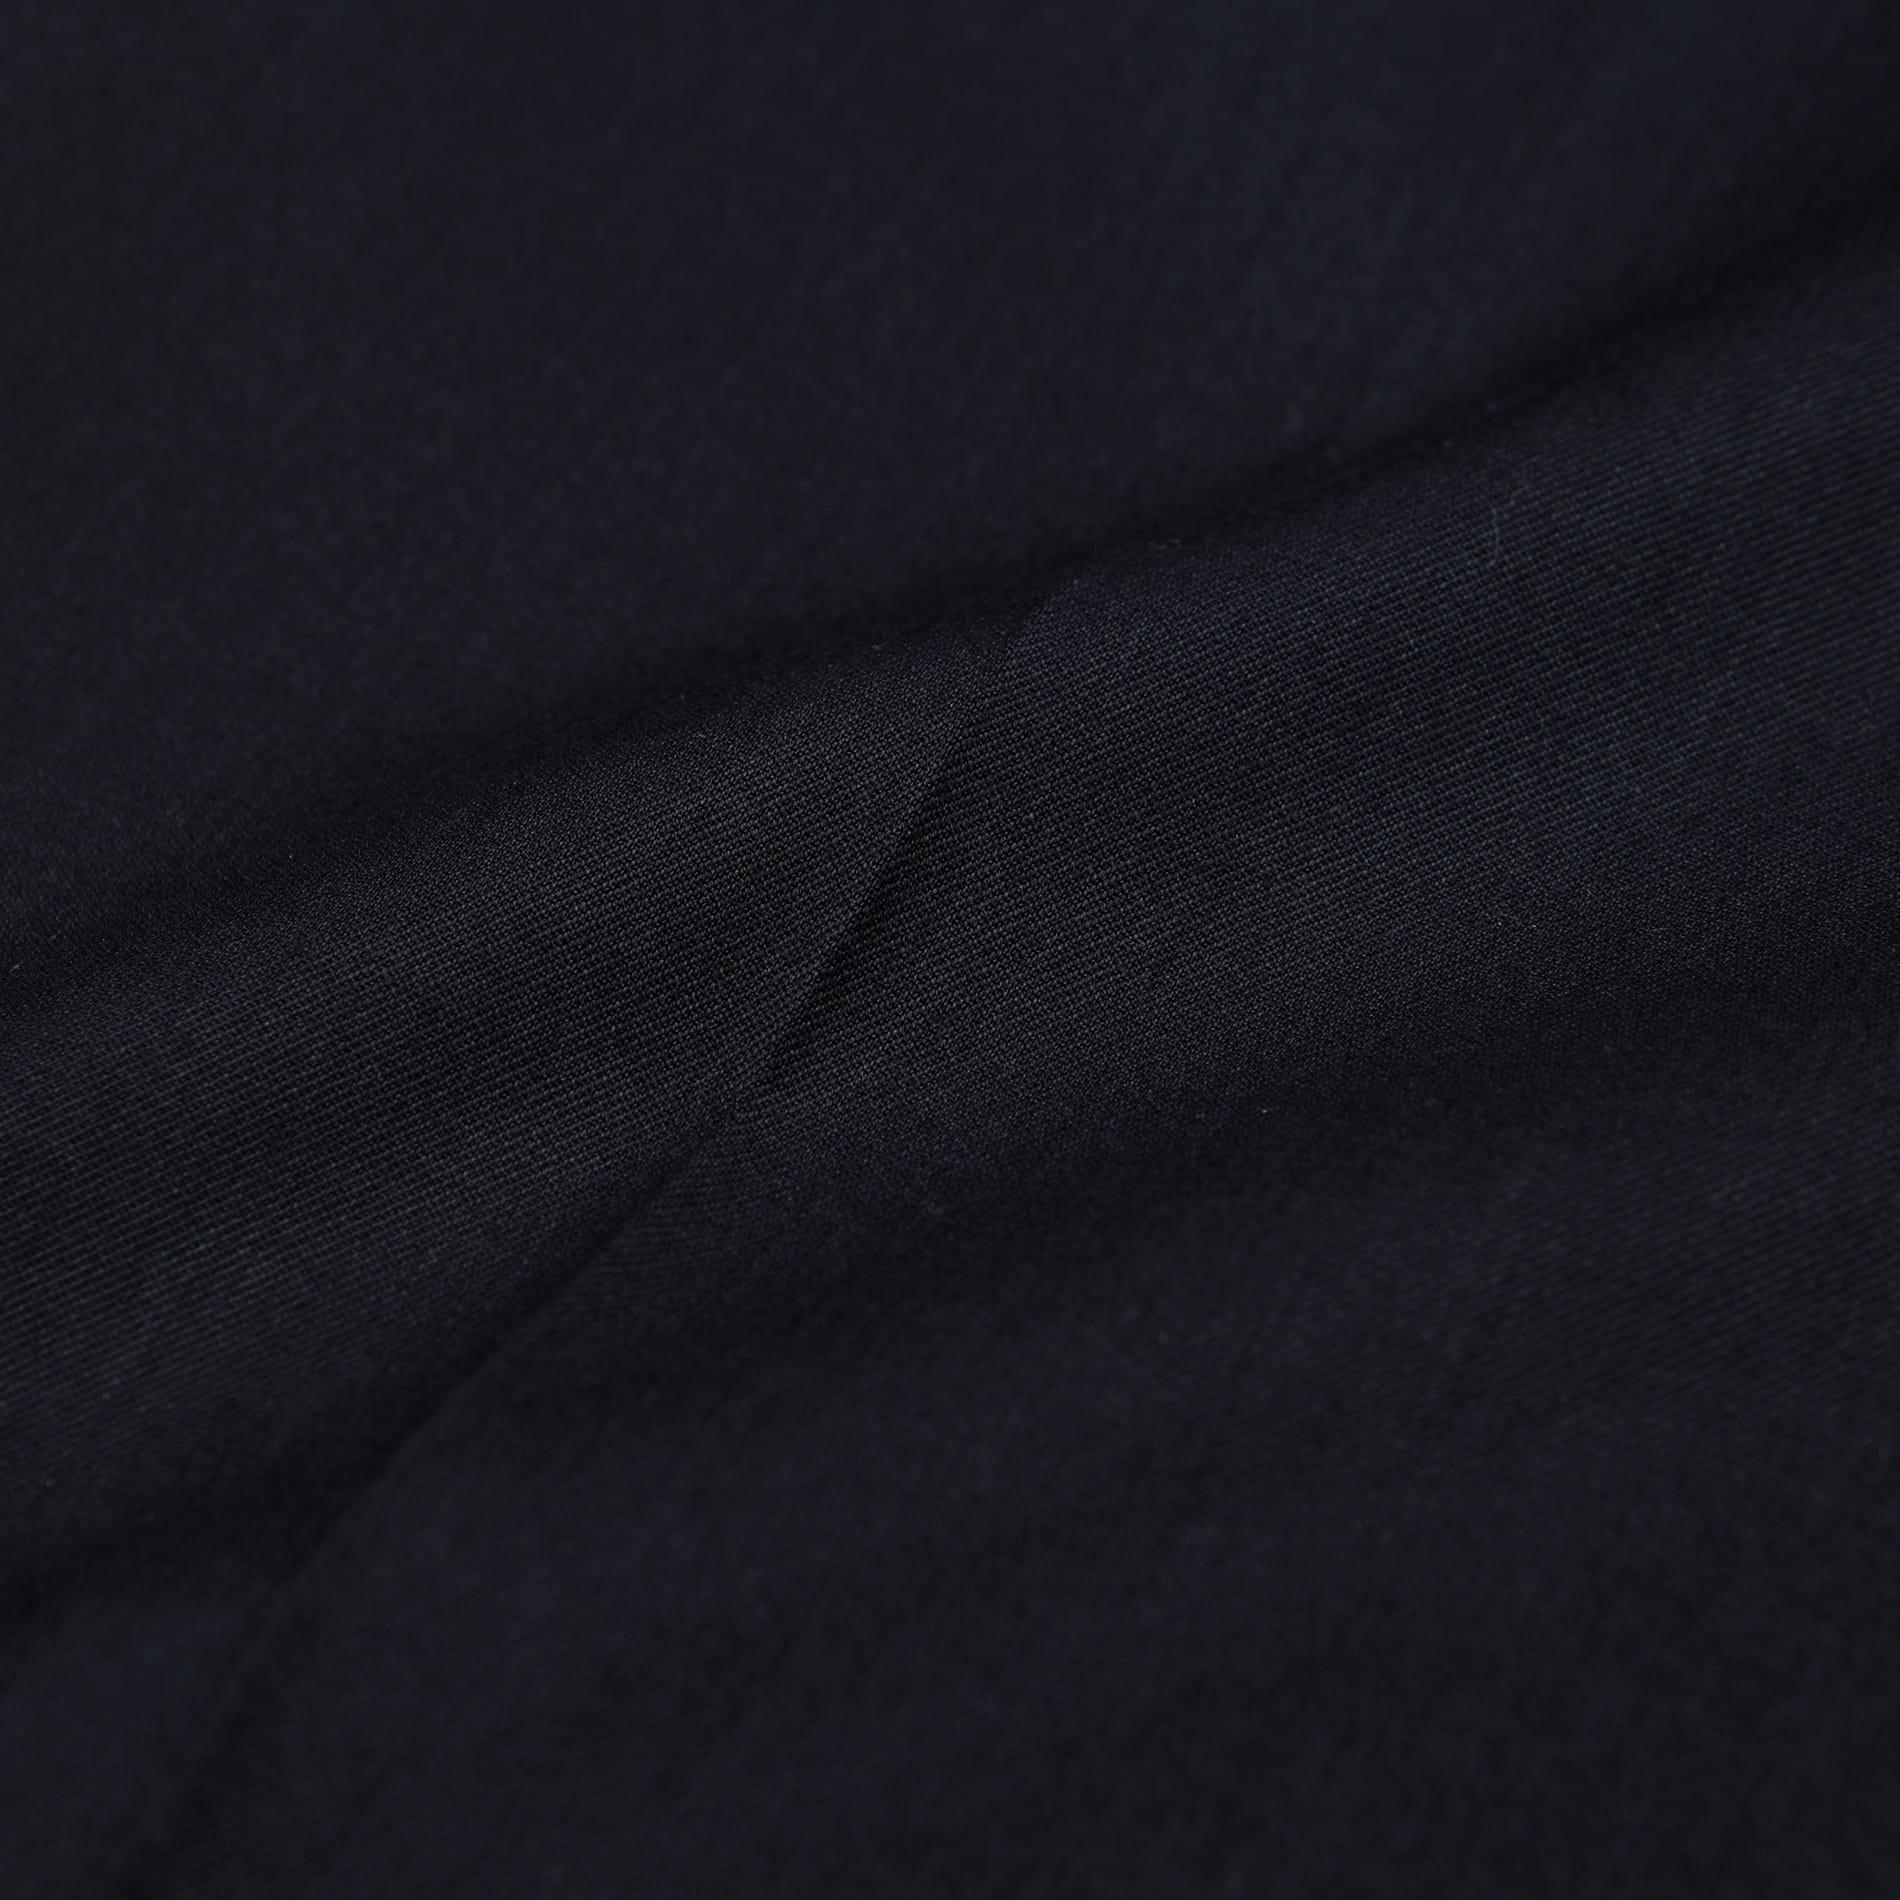 【otona MUSE掲載商品】サイドジップ セットアップ パンツ